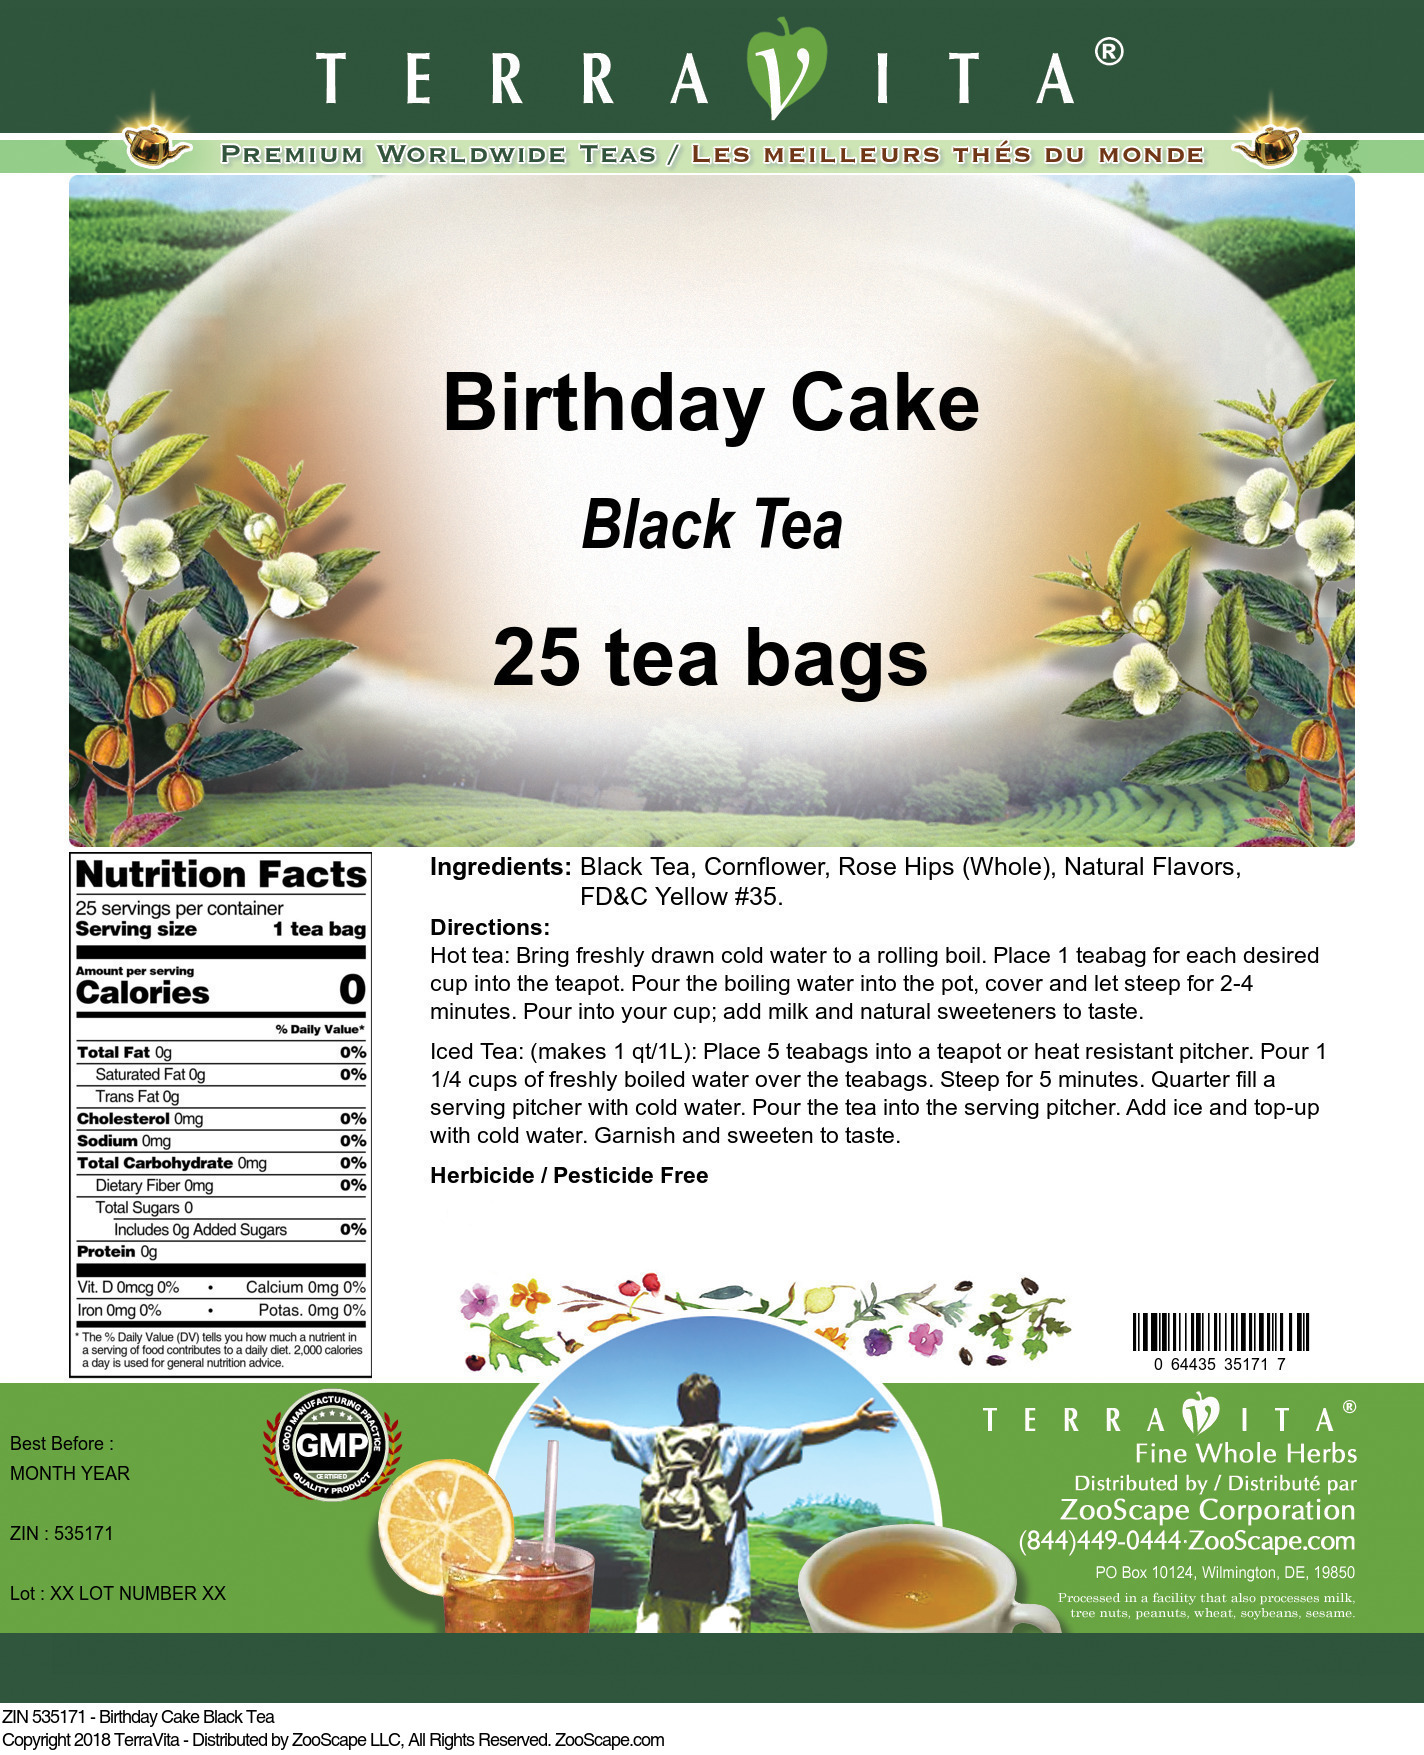 Birthday Cake Black Tea